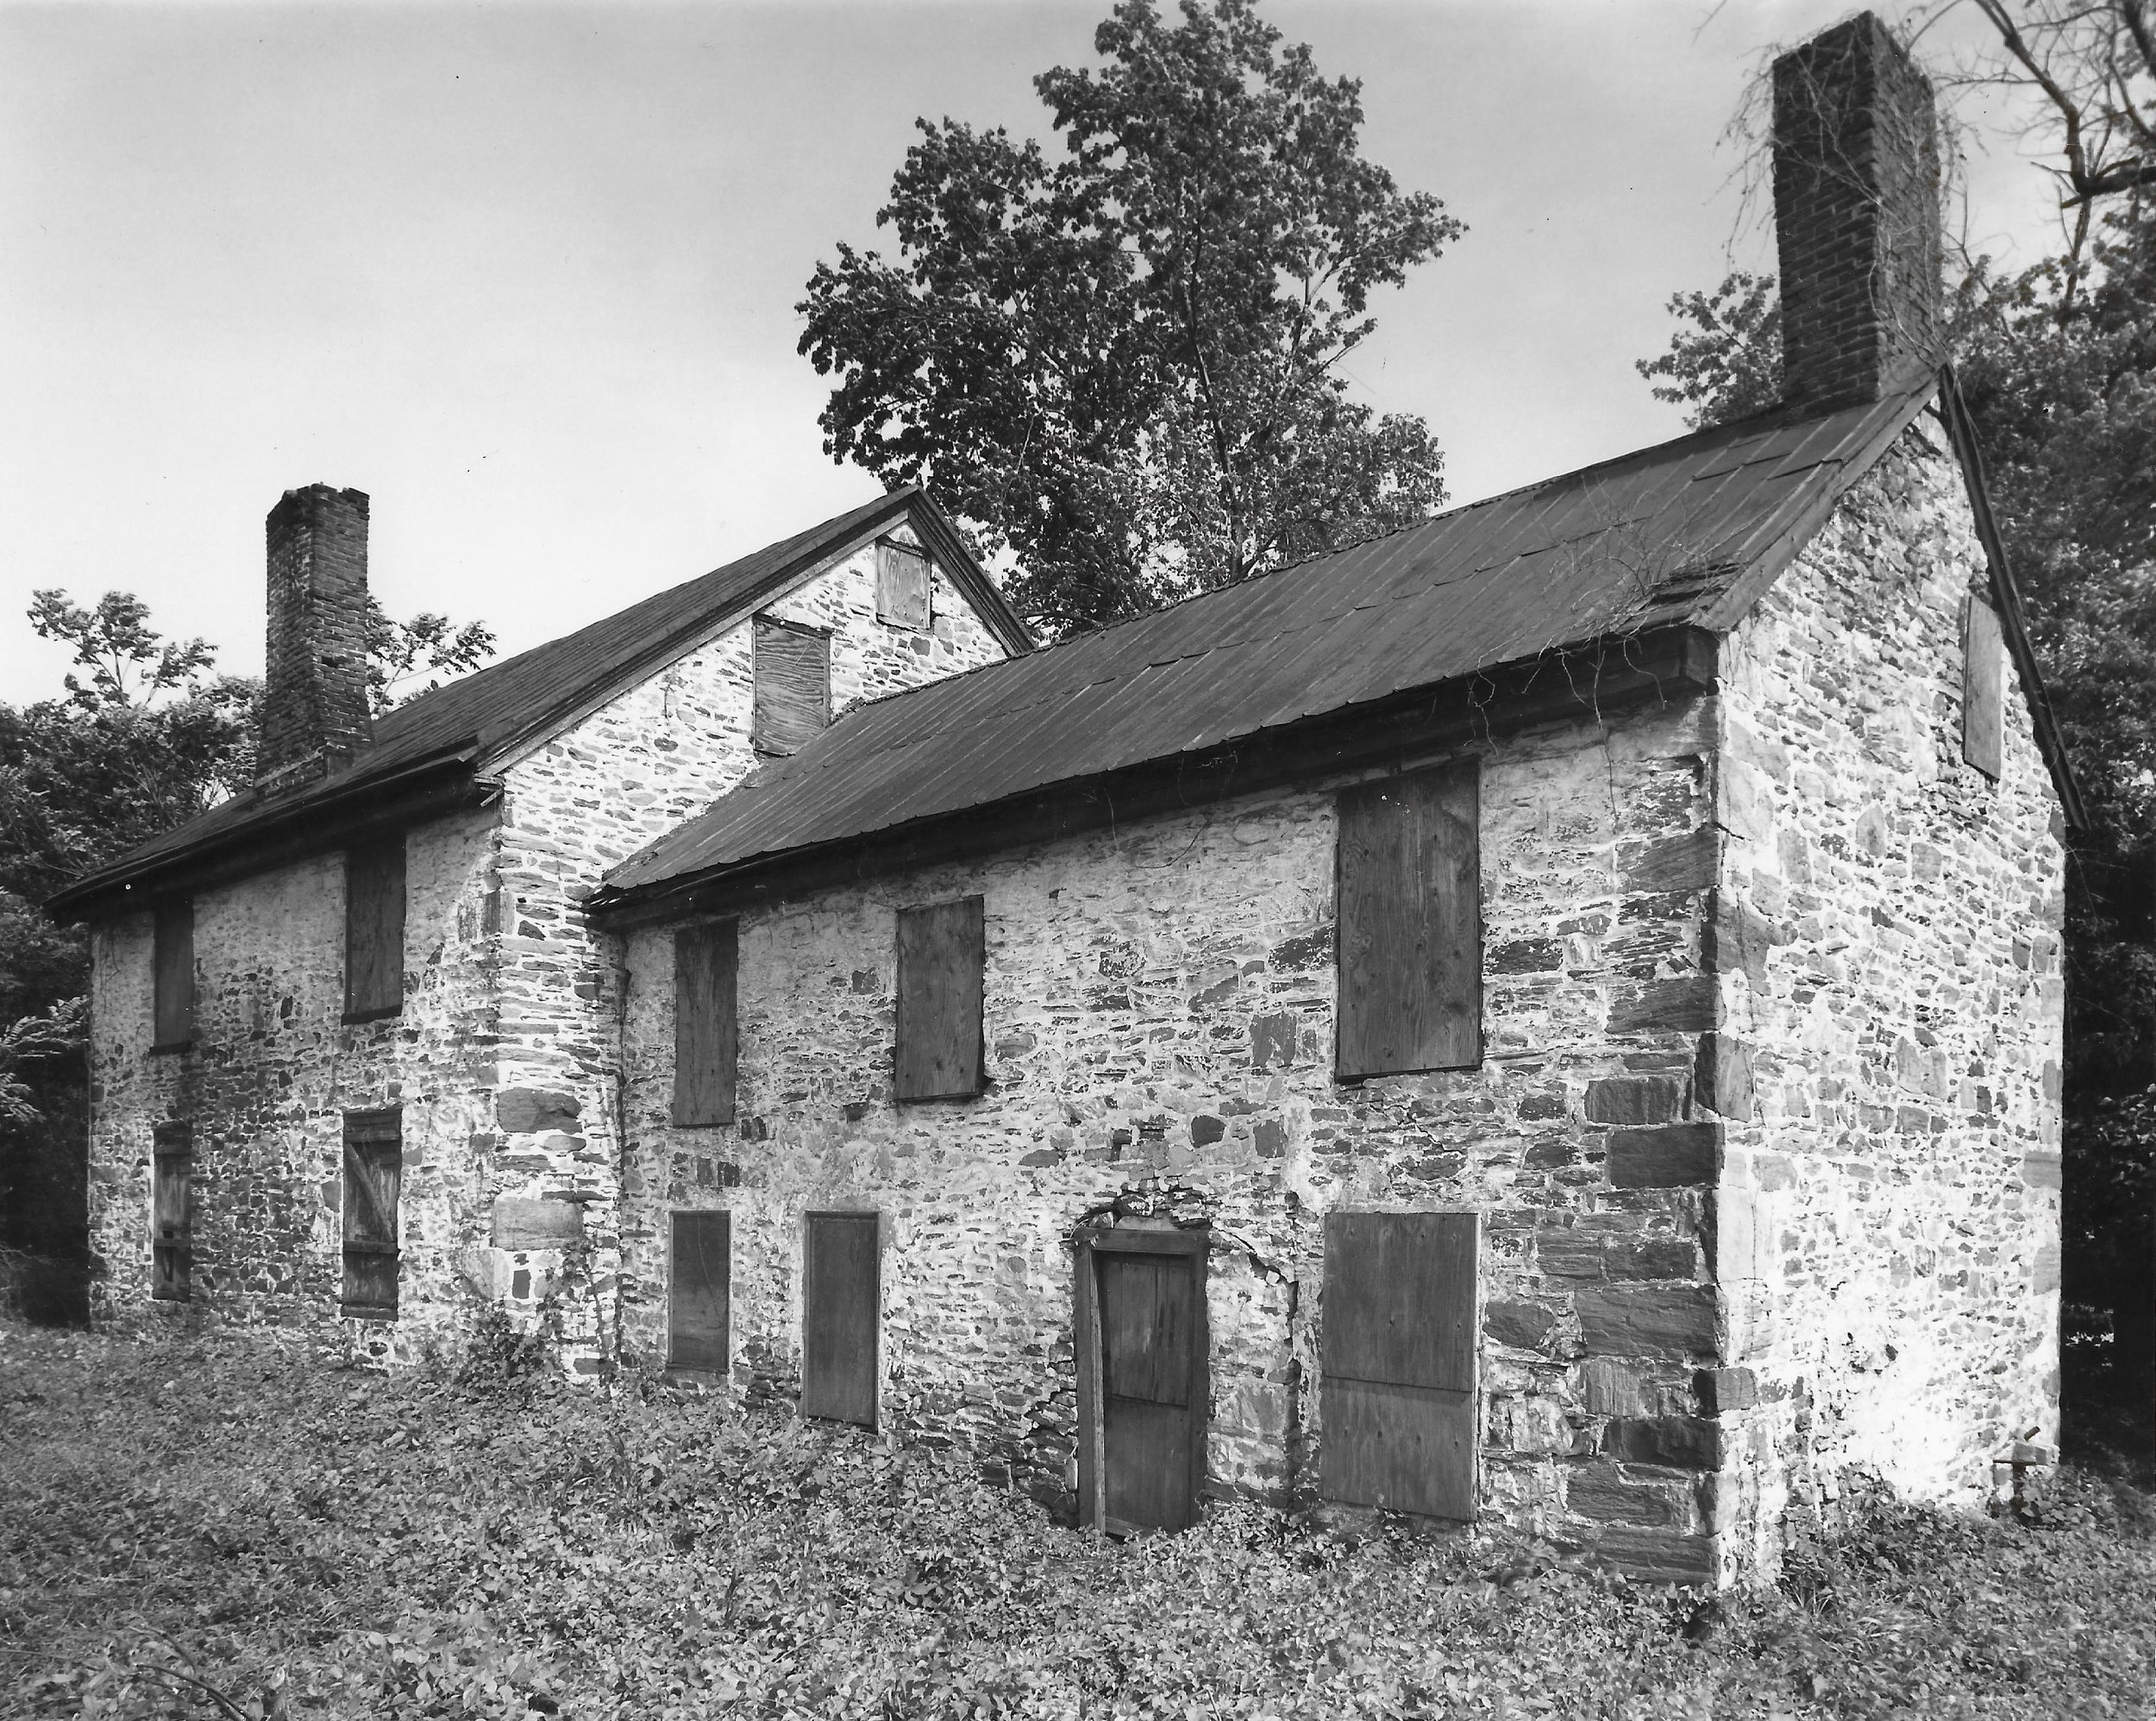 Millers House - Back of Building - Riverbend - Photo 5.JPG